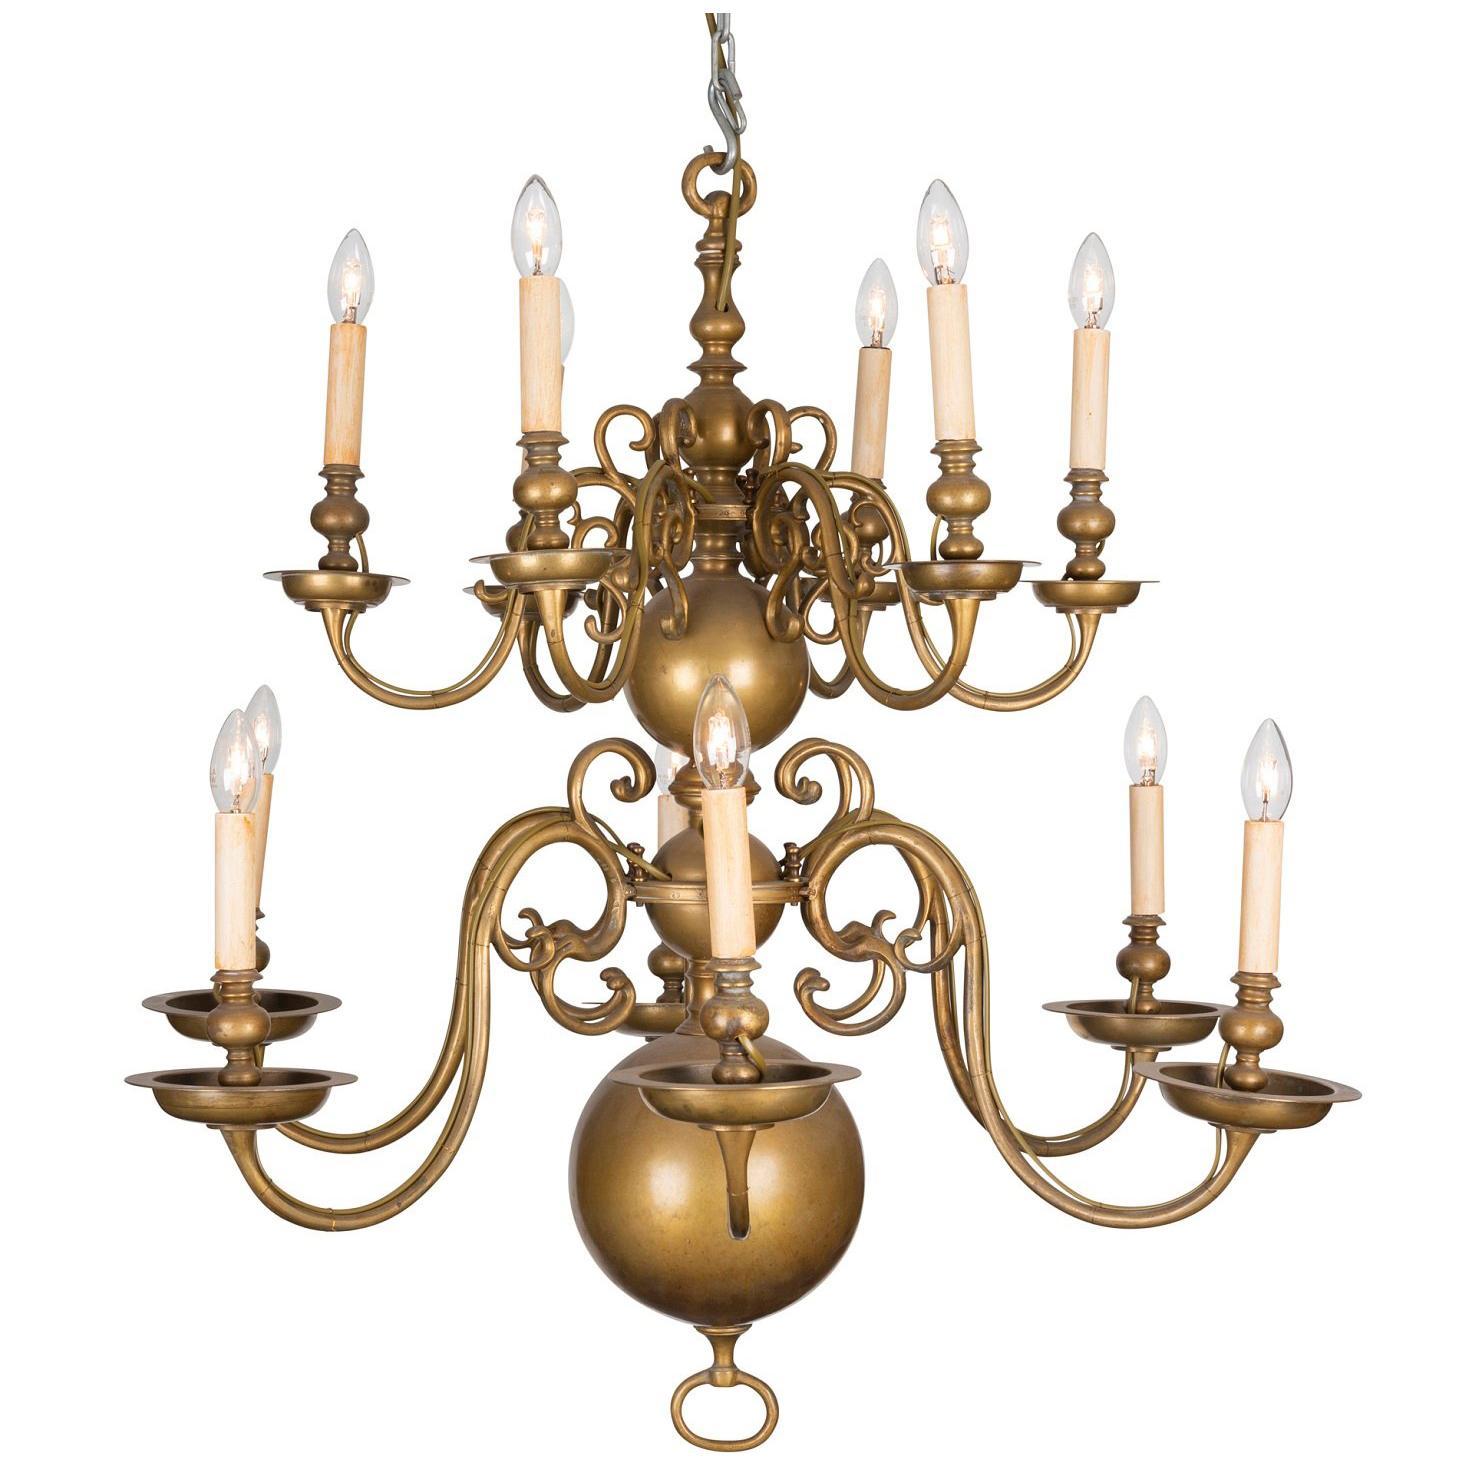 An 18th Century Twelve-Light Dutch Brass Two-Tier Chandelier